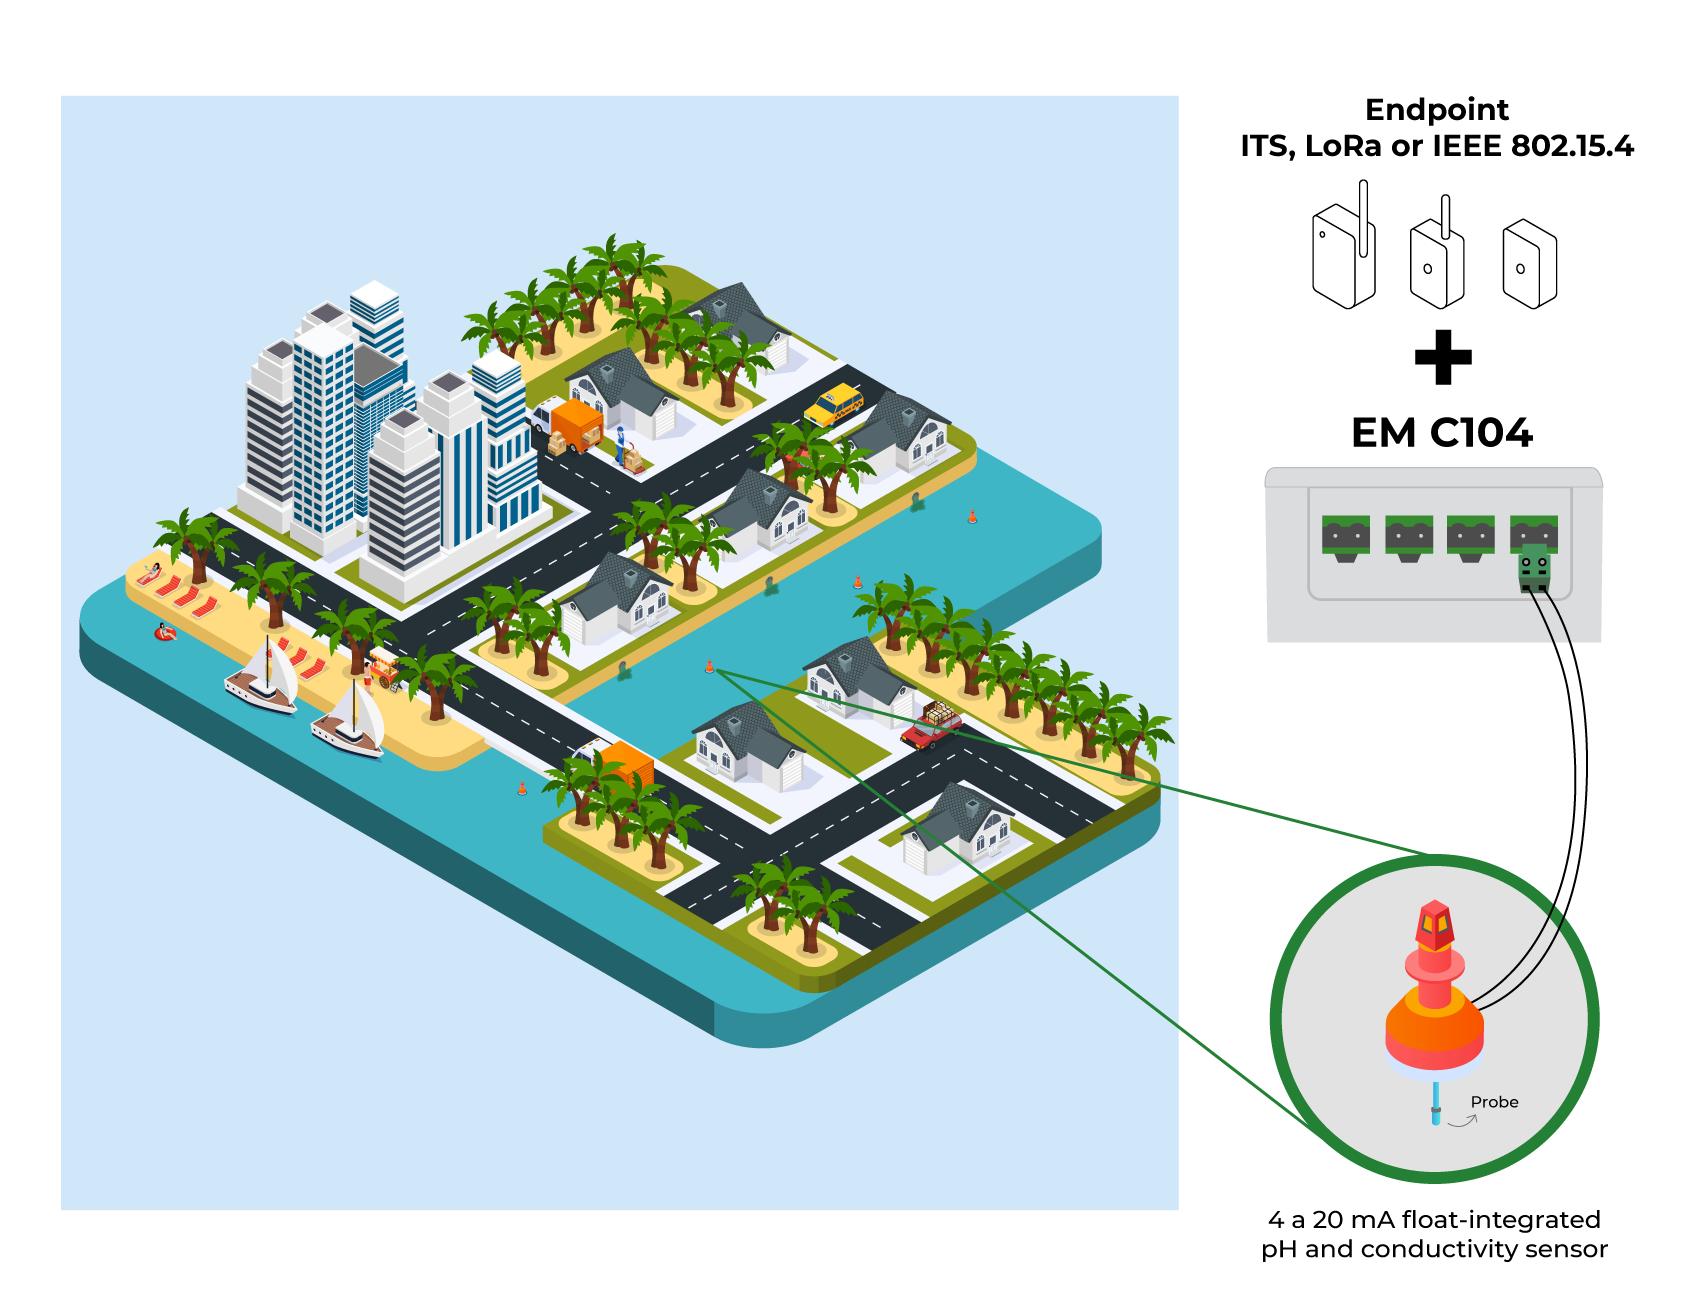 Application model 2 - EM C104 (Khomp IoT Endpoint Extension)